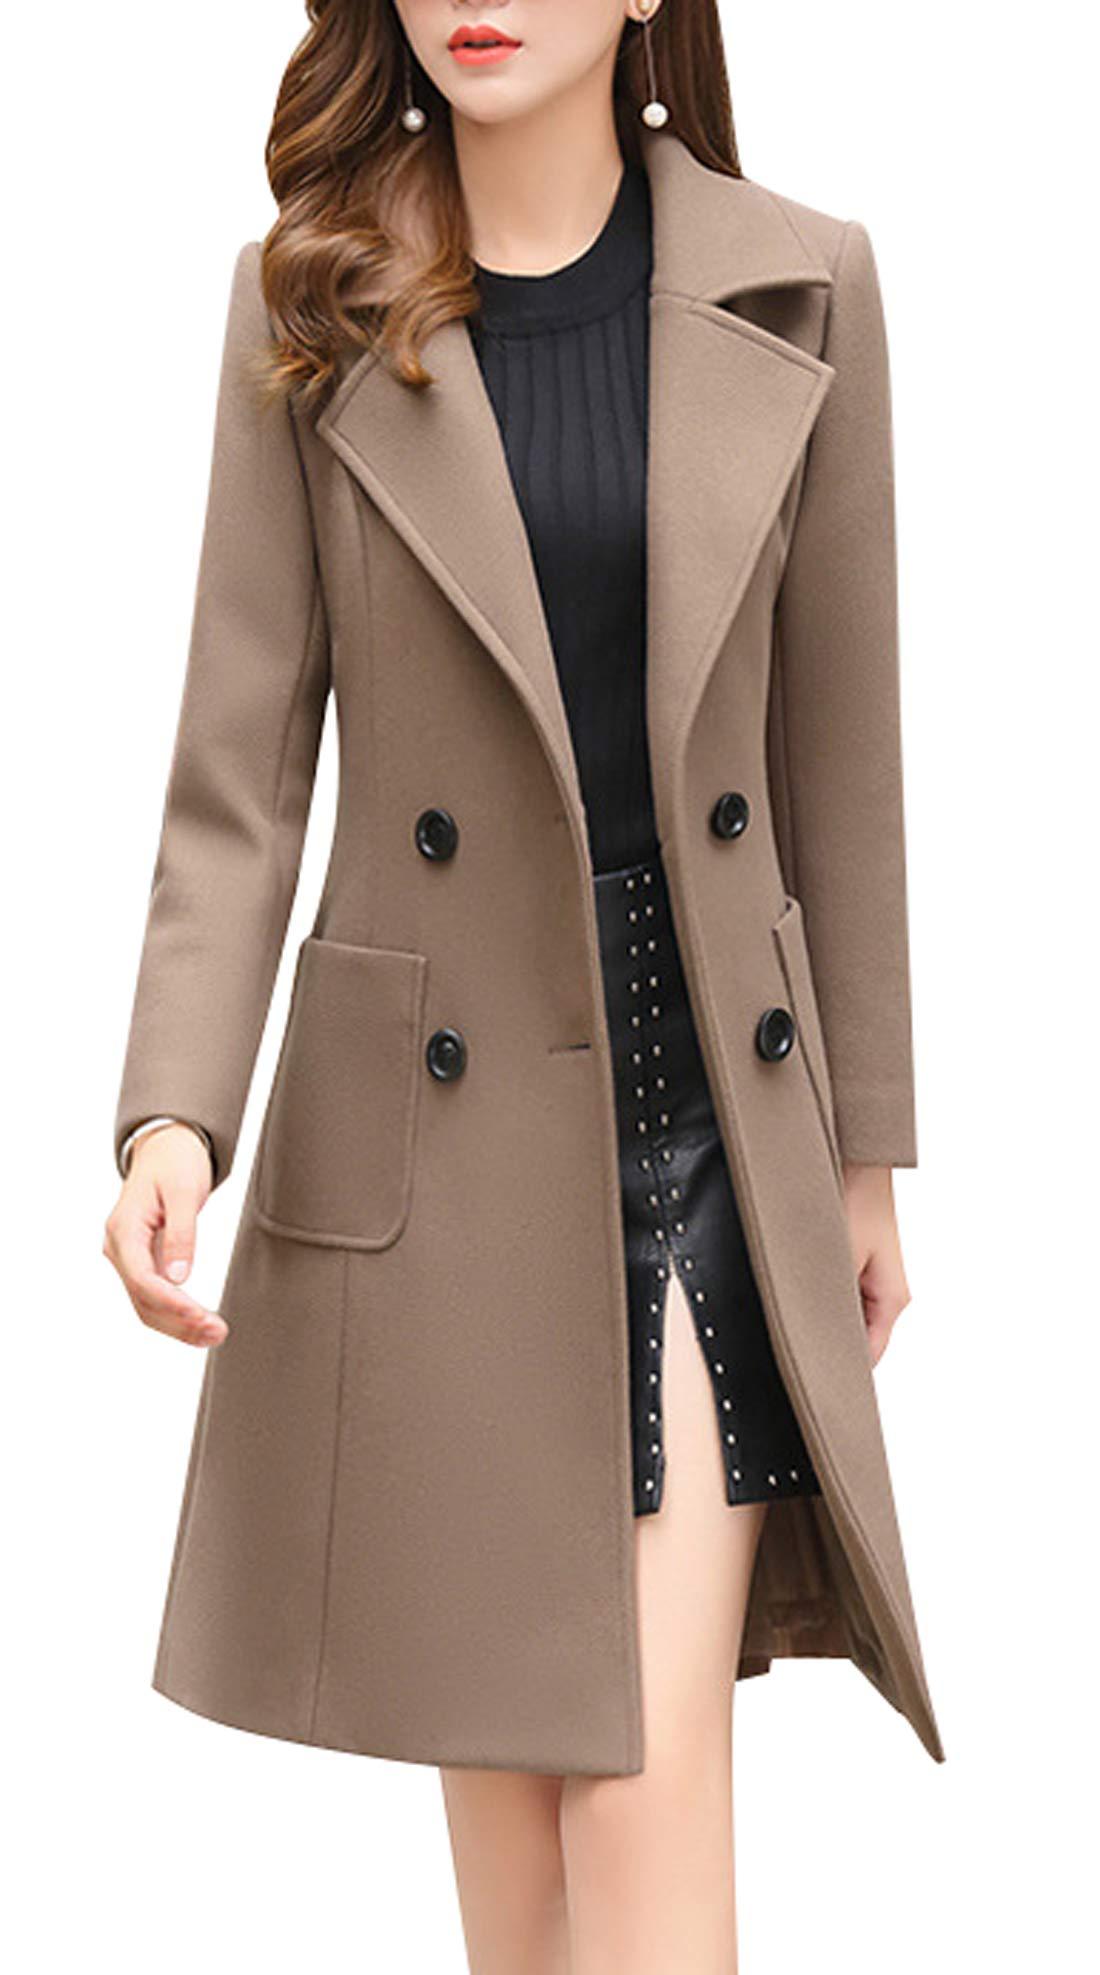 chouyatou Women Elegant Notched Collar Double Breasted Wool Blend Over Coat (Large, Khaki) by chouyatou